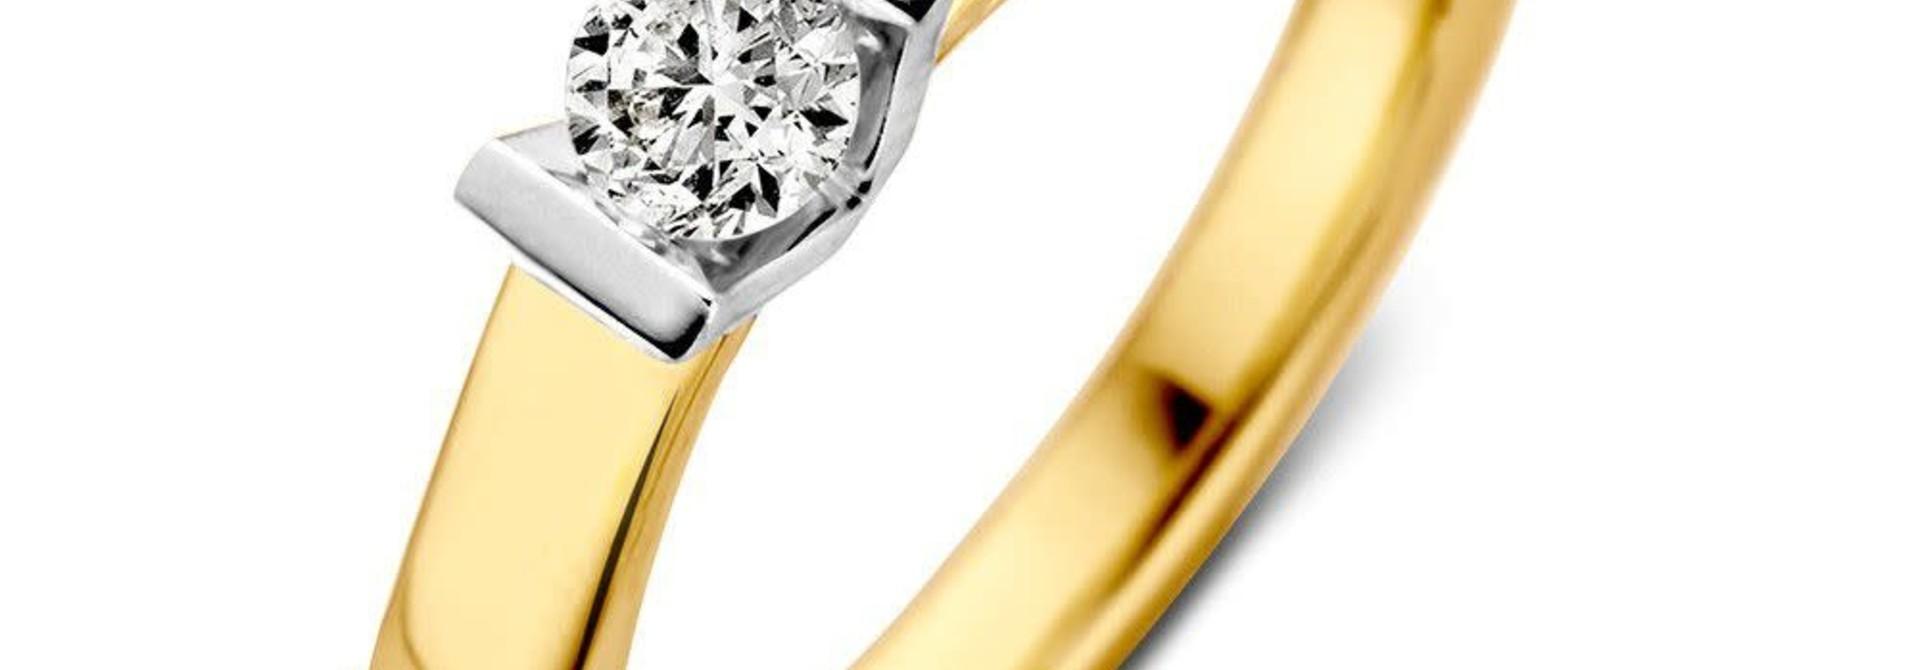 Ring bicolor brilliant RG416837